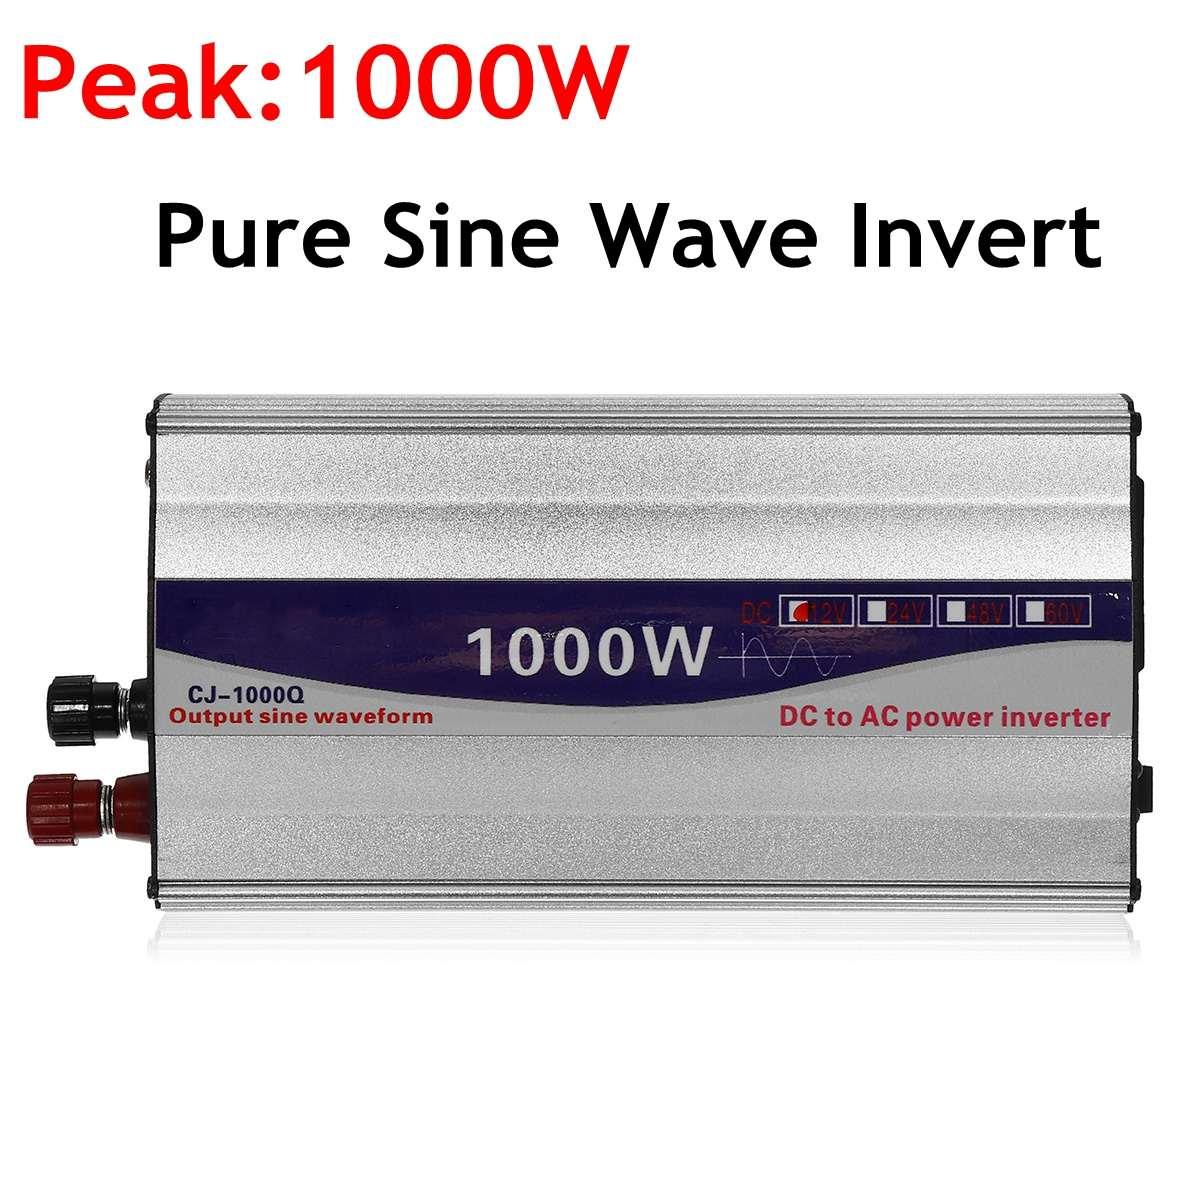 1 Set LED Display 1000W Pure Sine Wave Power Inverter 12V/ 24V To 110V Converter Transformer Power Supply